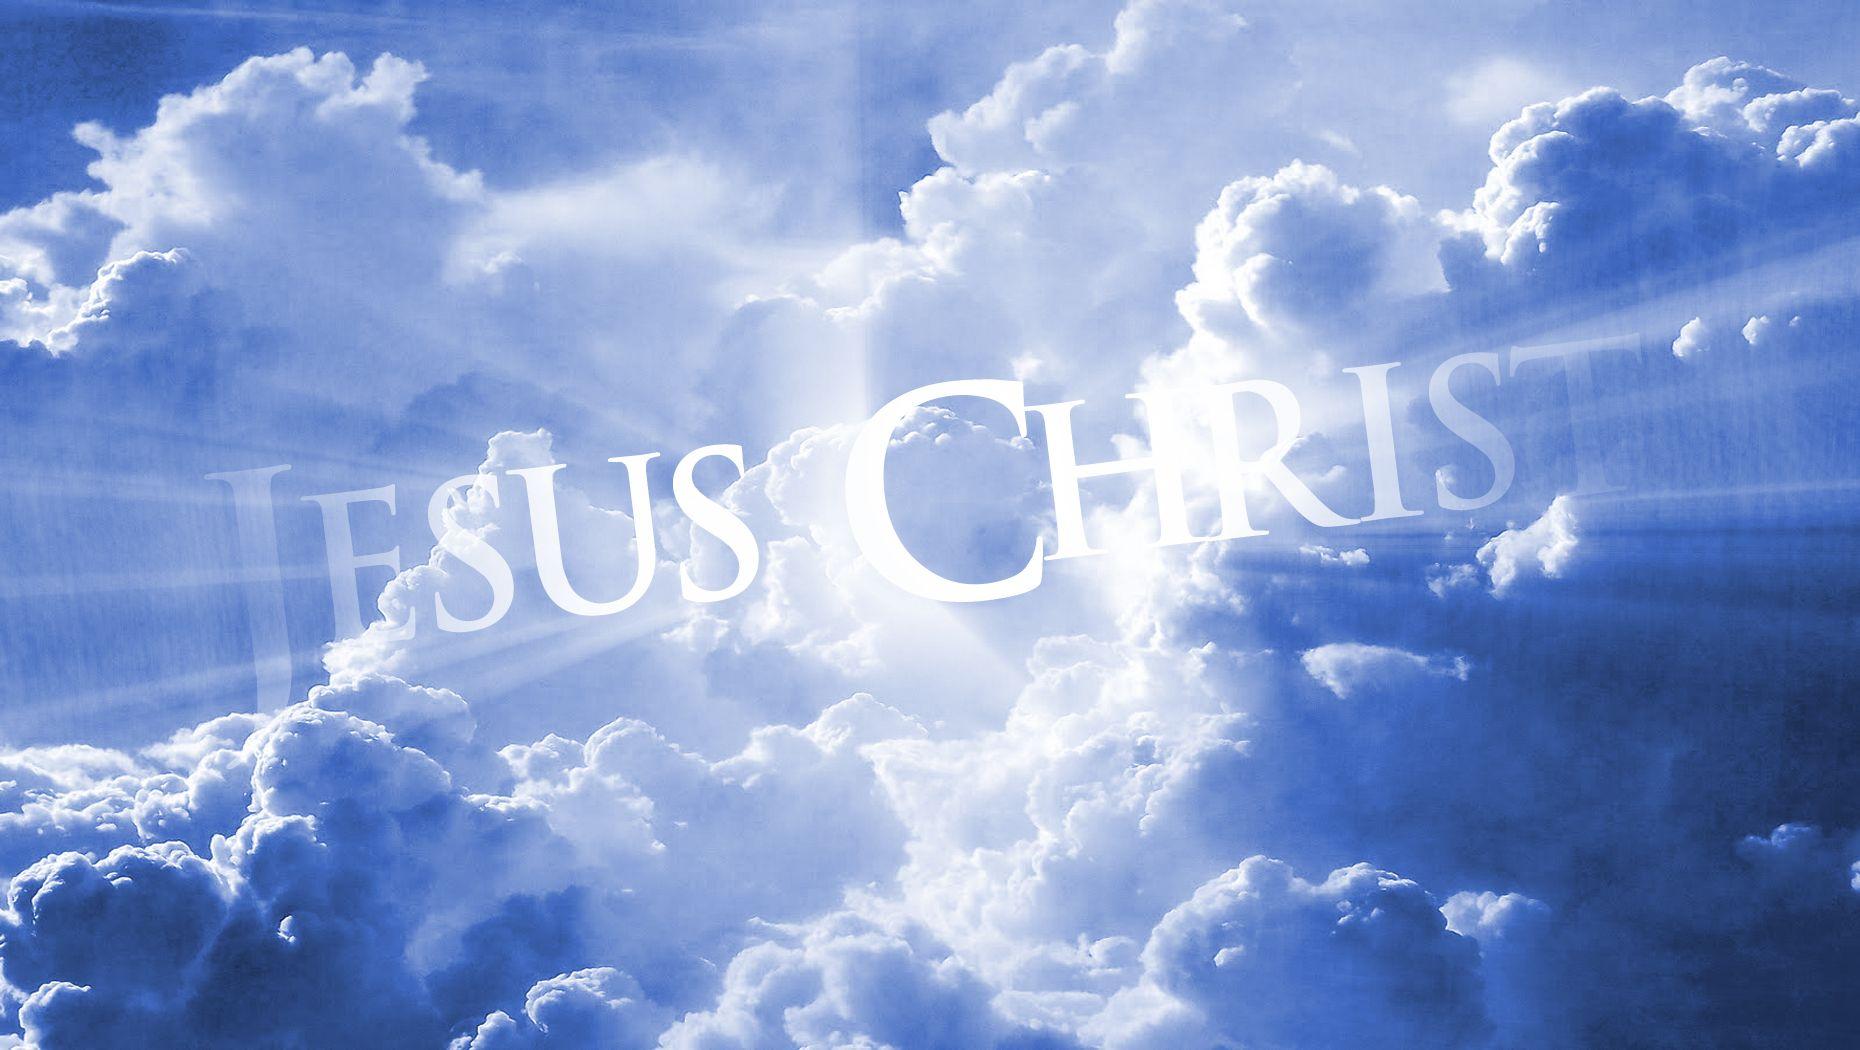 Jesus Christ In Heaven Jesus Wallpaper Jesus Christian Wallpaper